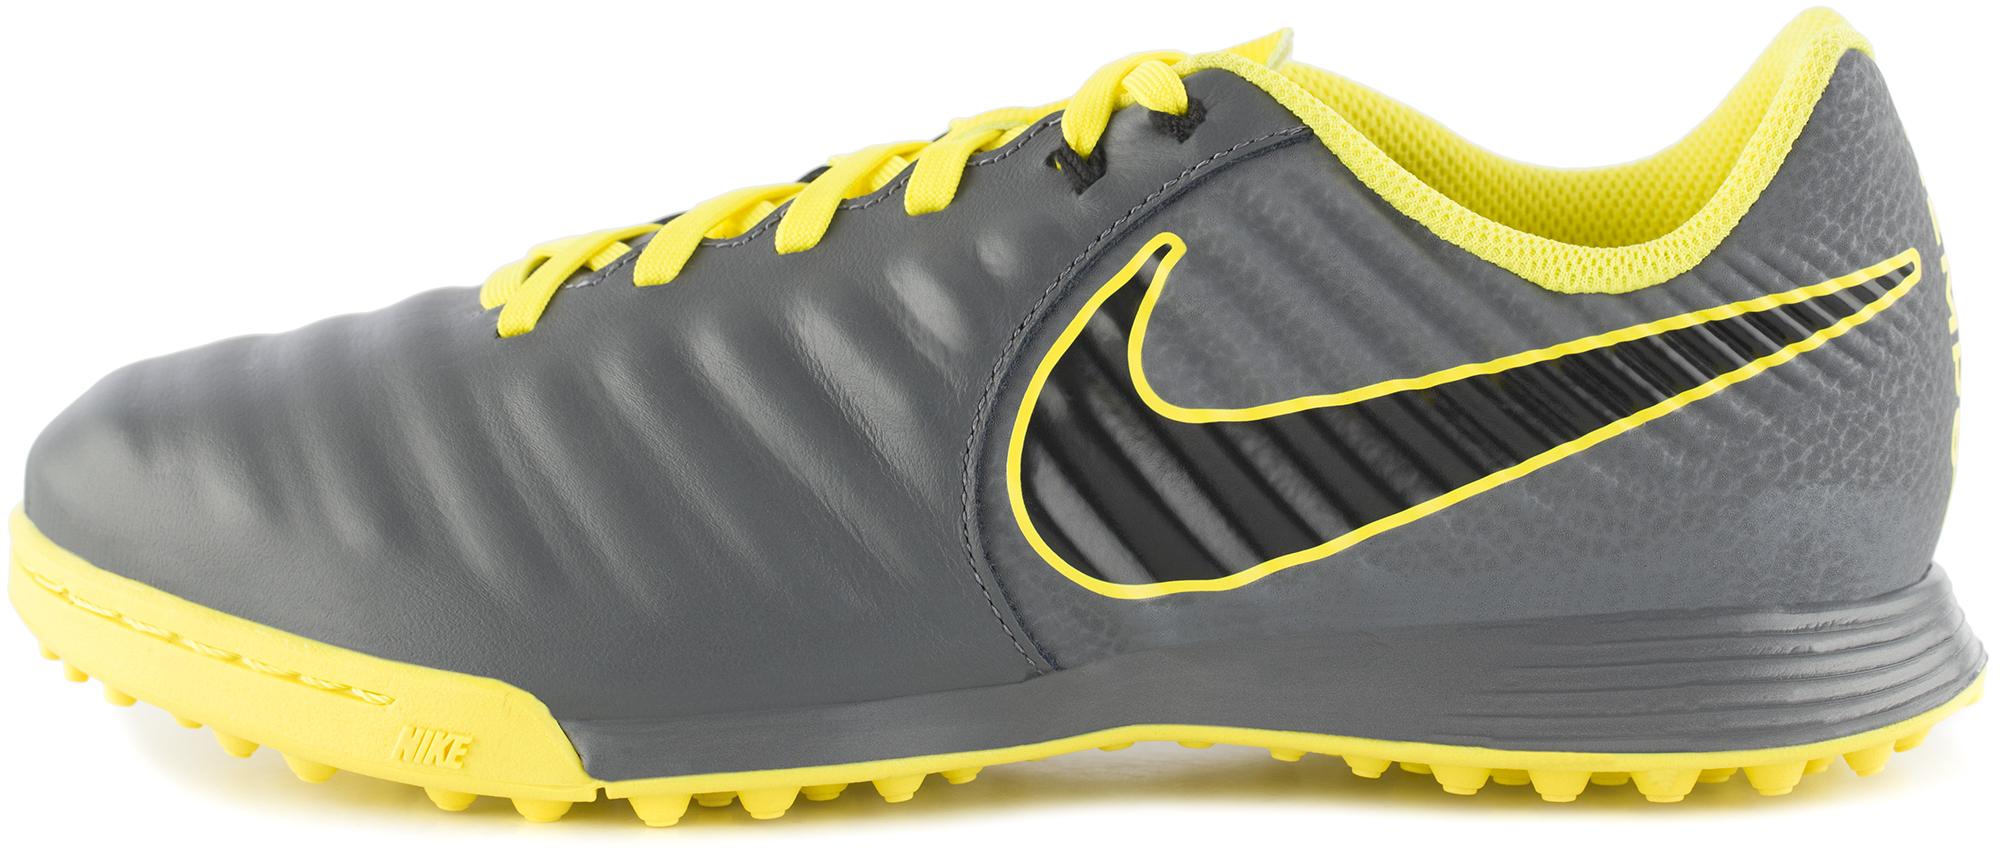 Nike Бутсы для мальчиков Nike Legend 7 Academy TF, размер 37,5